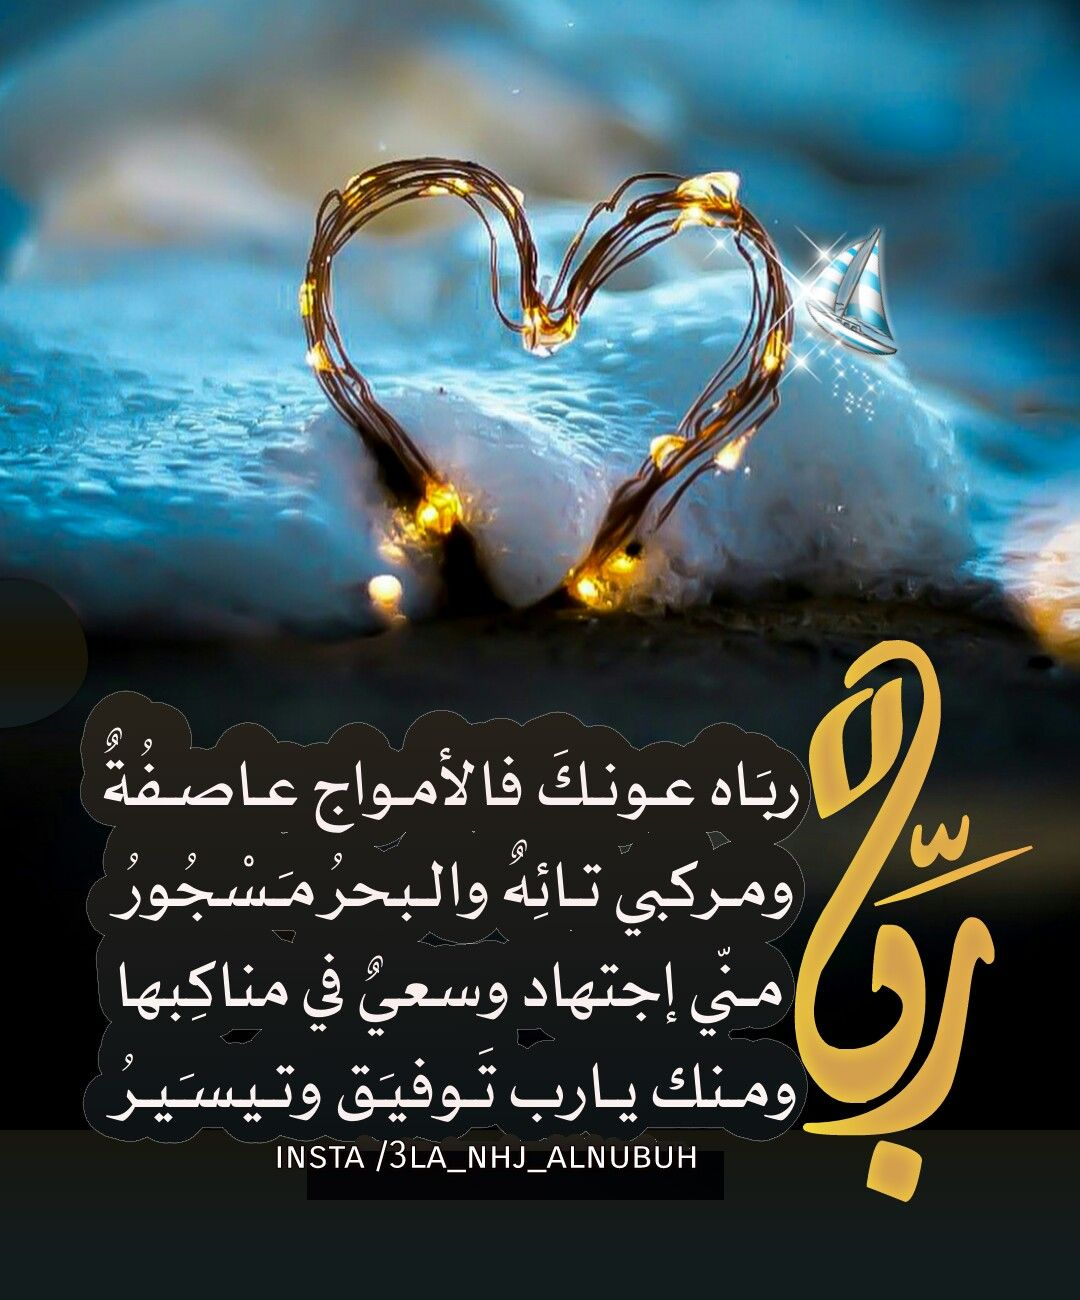 Pin By Um Ahmad On الصباح والمساء Romantic Love Quotes Romantic Love Romantic